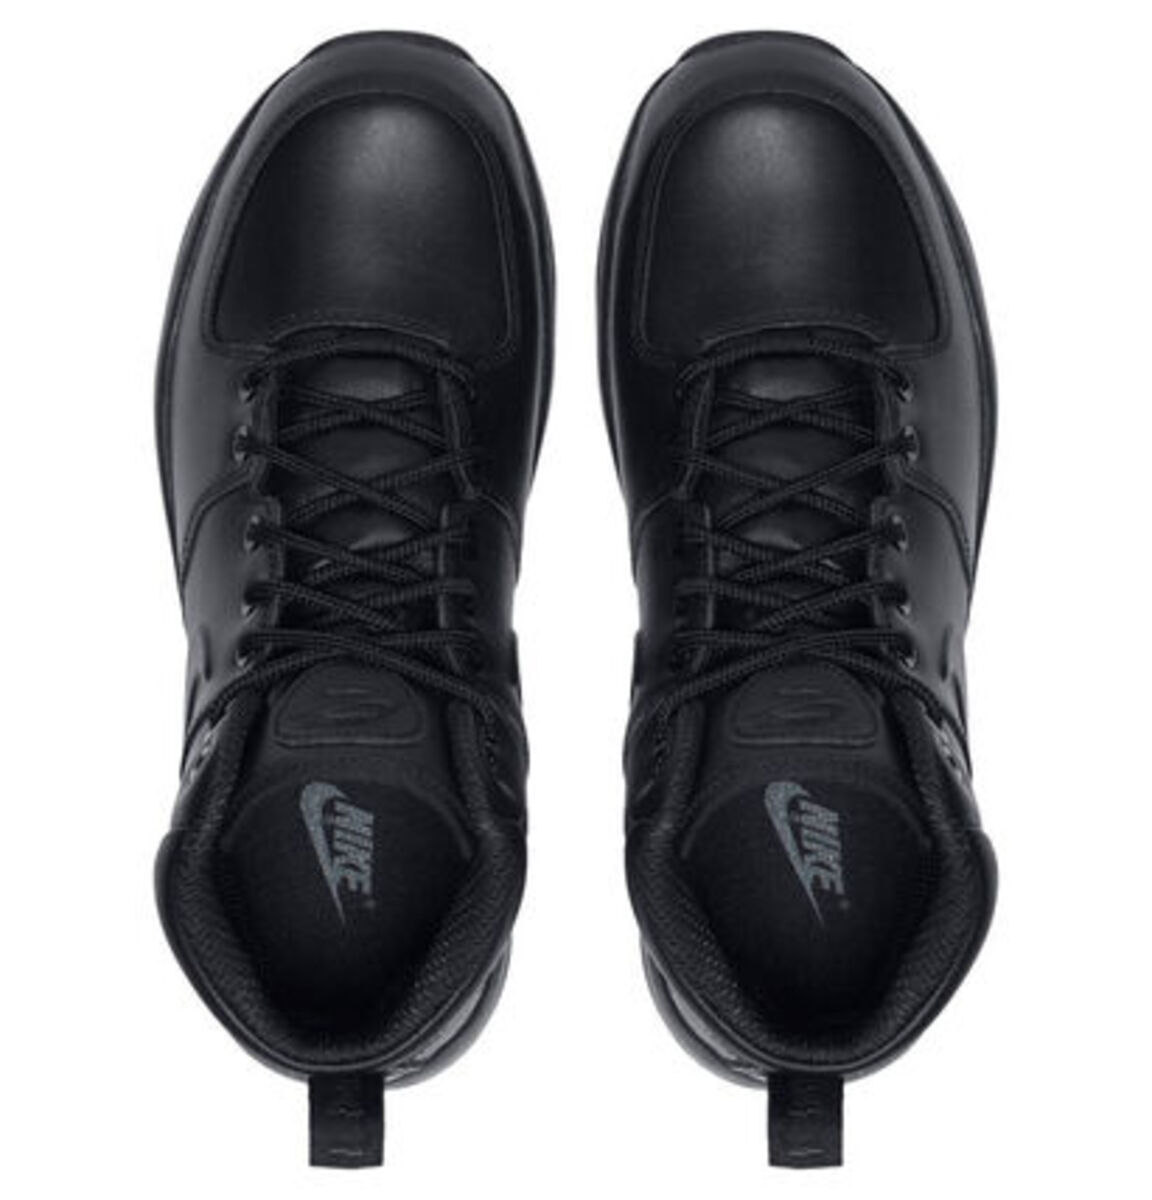 Bild 2 von Nike Herren Boots Manoa